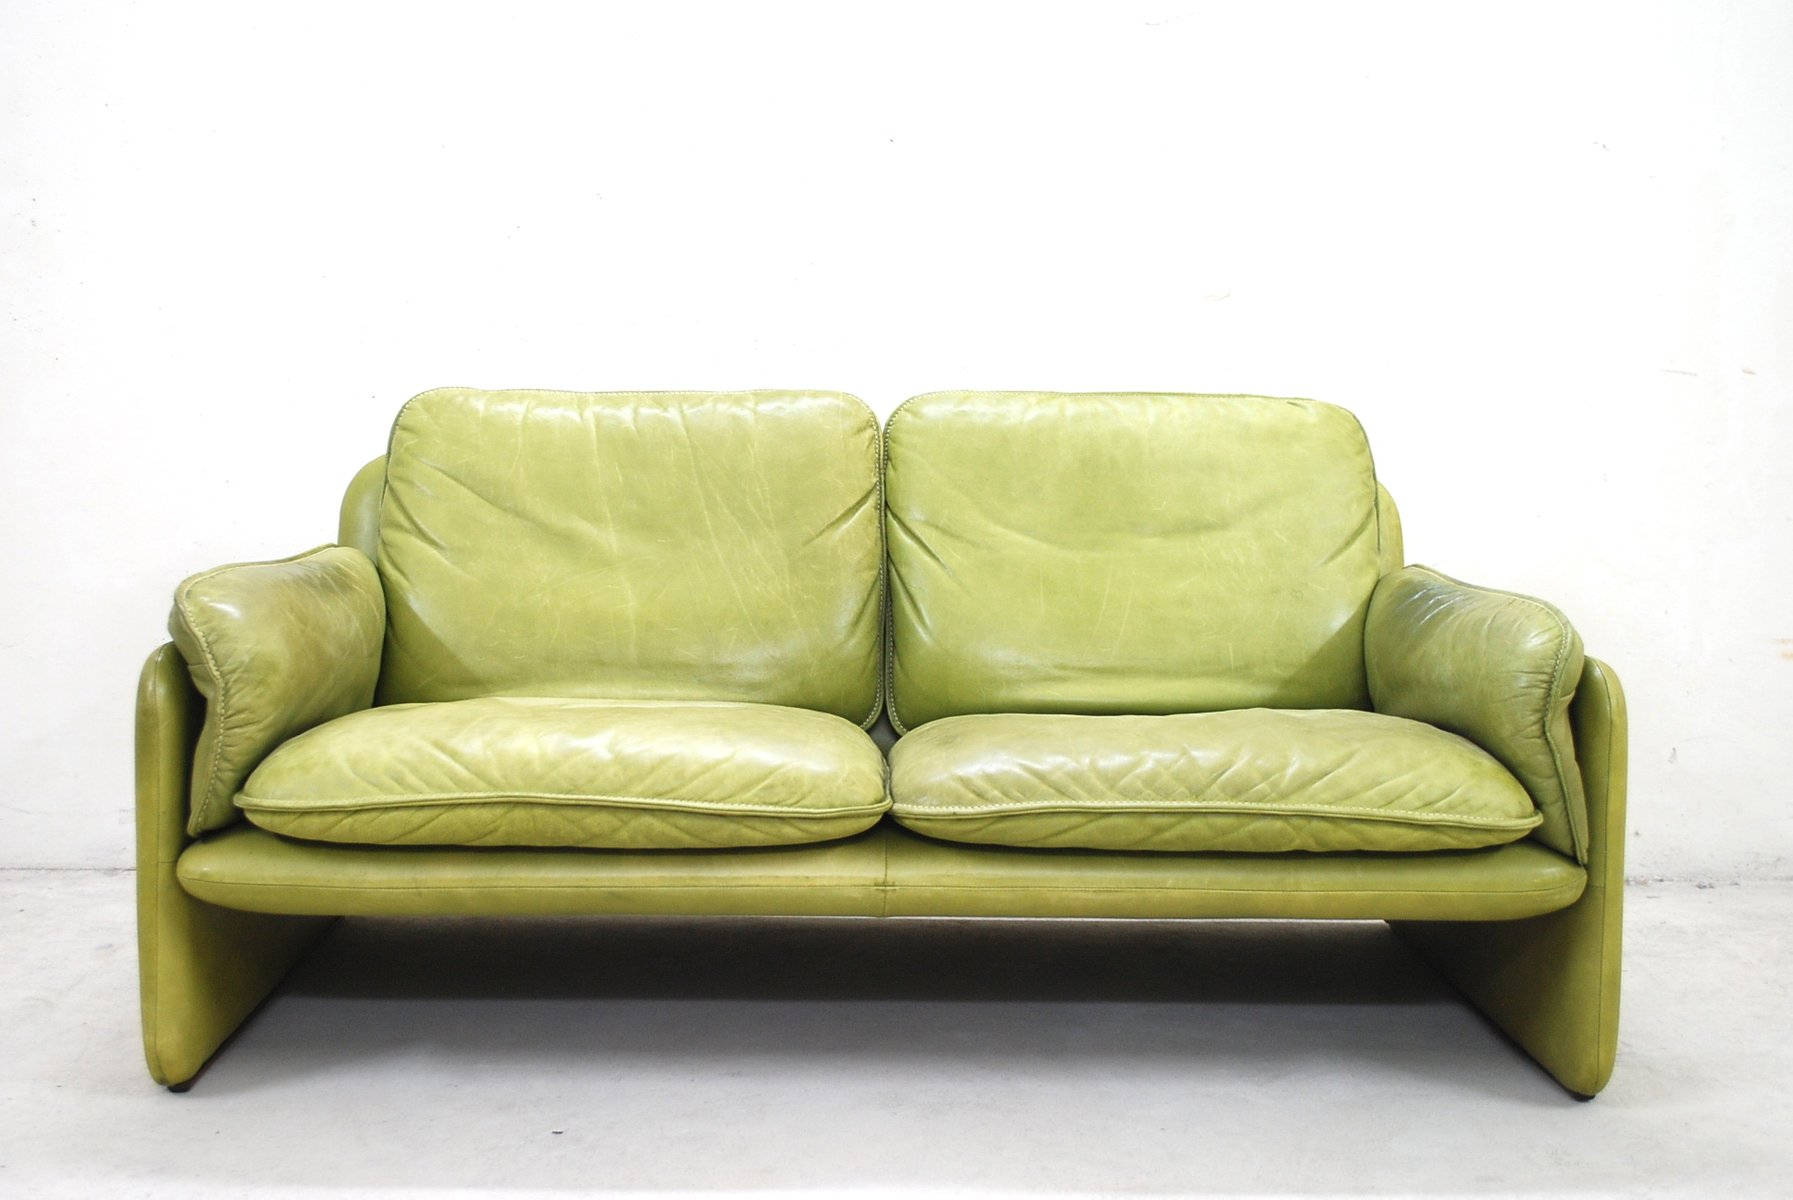 Canap ds 61 vintage en cuir vert citron par de sede en vente sur pamono - Canape cuir vert ...